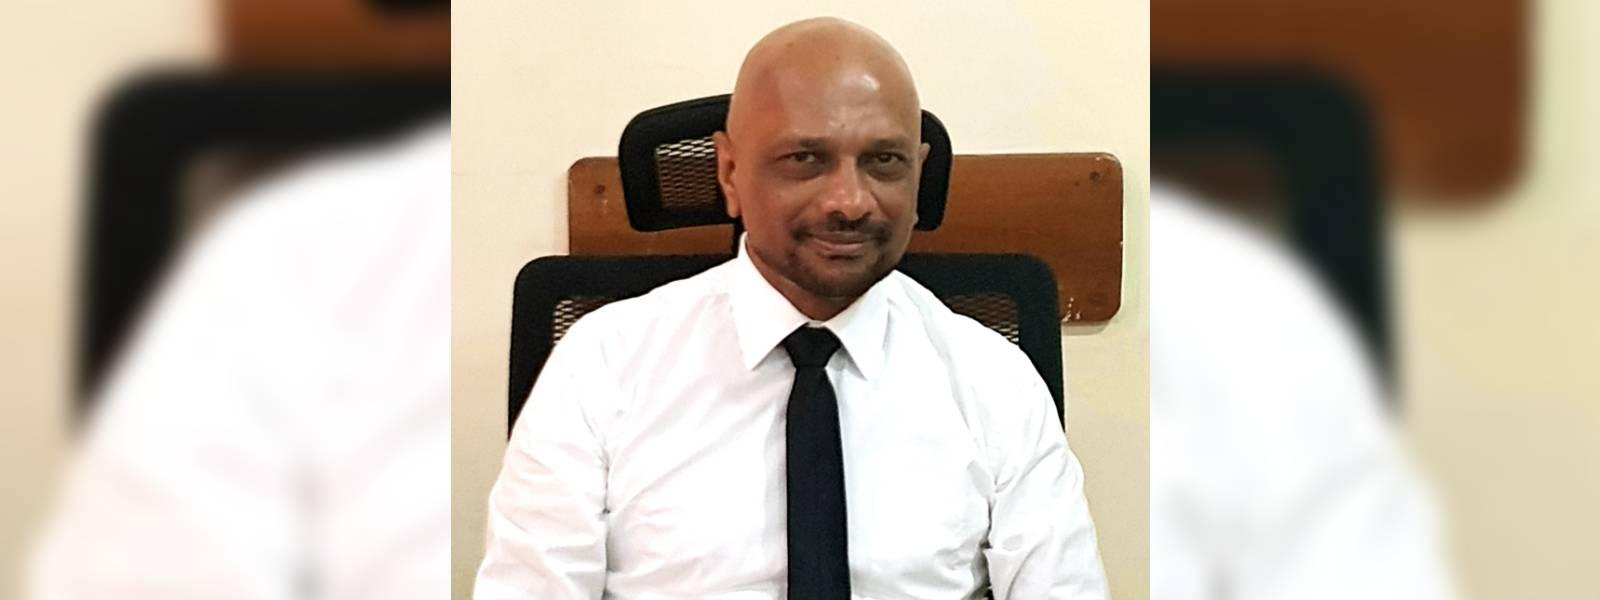 Kurunegala Hospital Director faces backlash after refusing job transfer